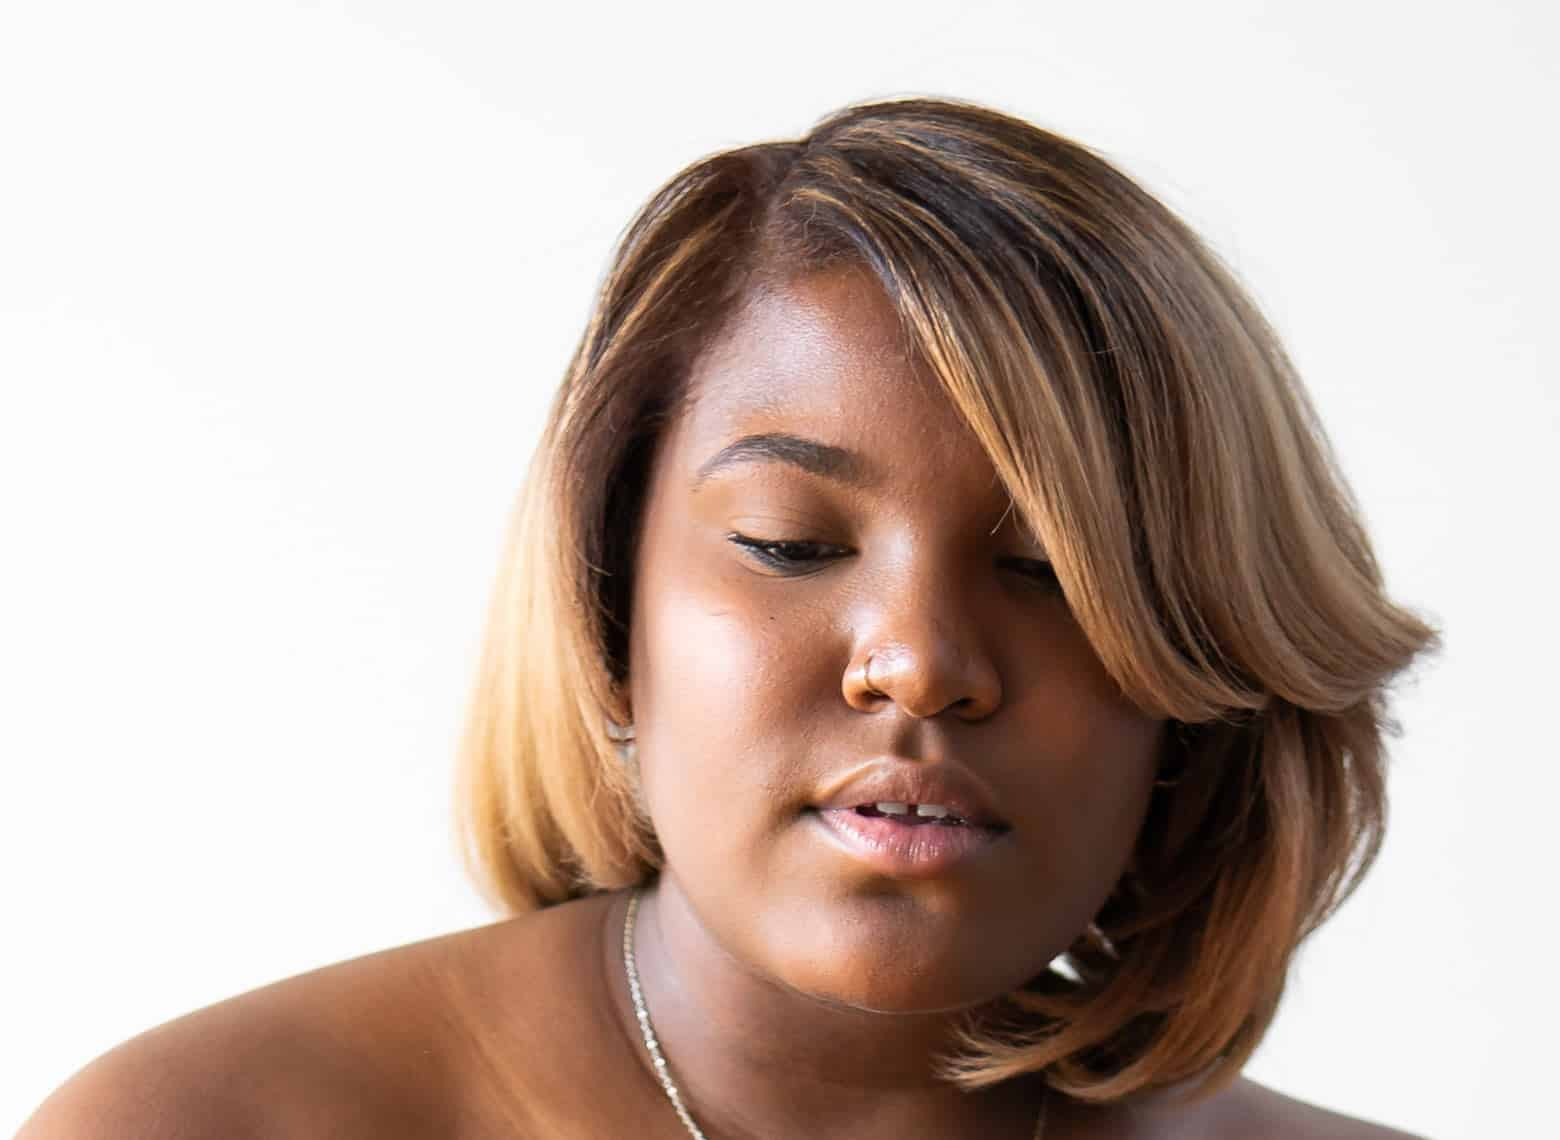 woman with bob side bangs